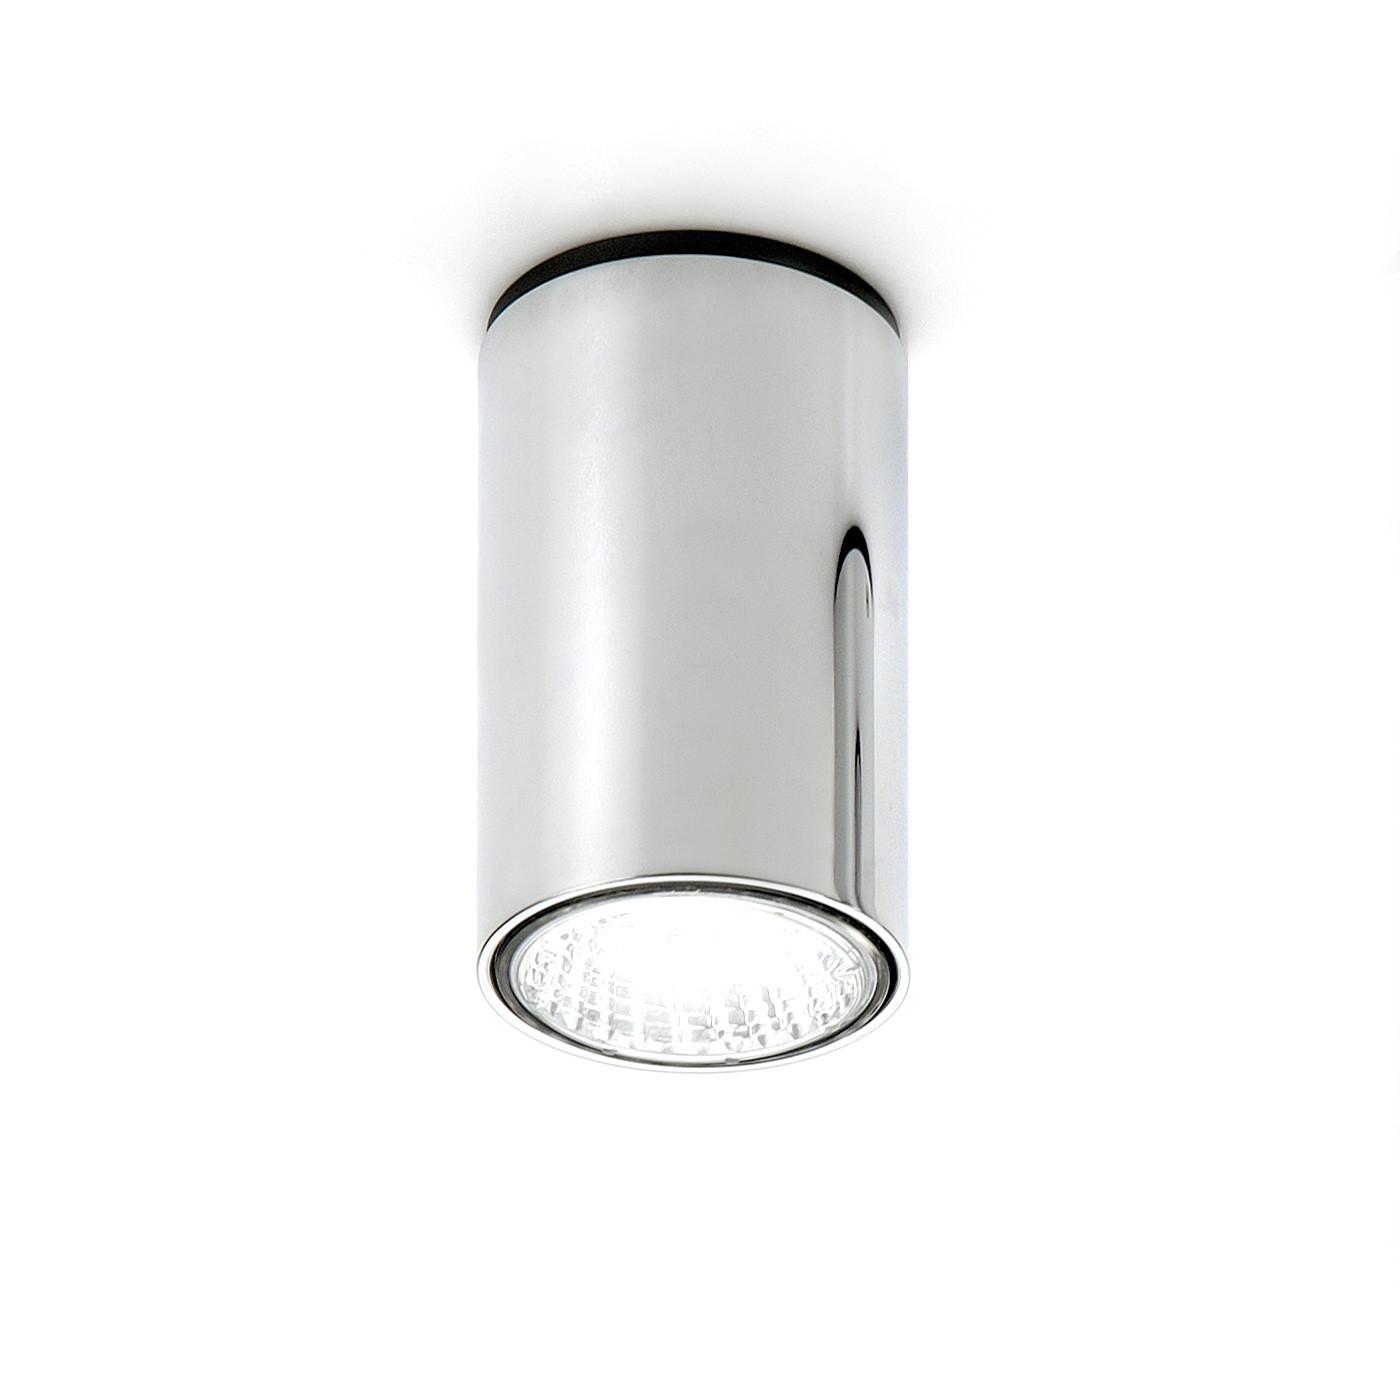 Milan Kronn ceiling lamp small version